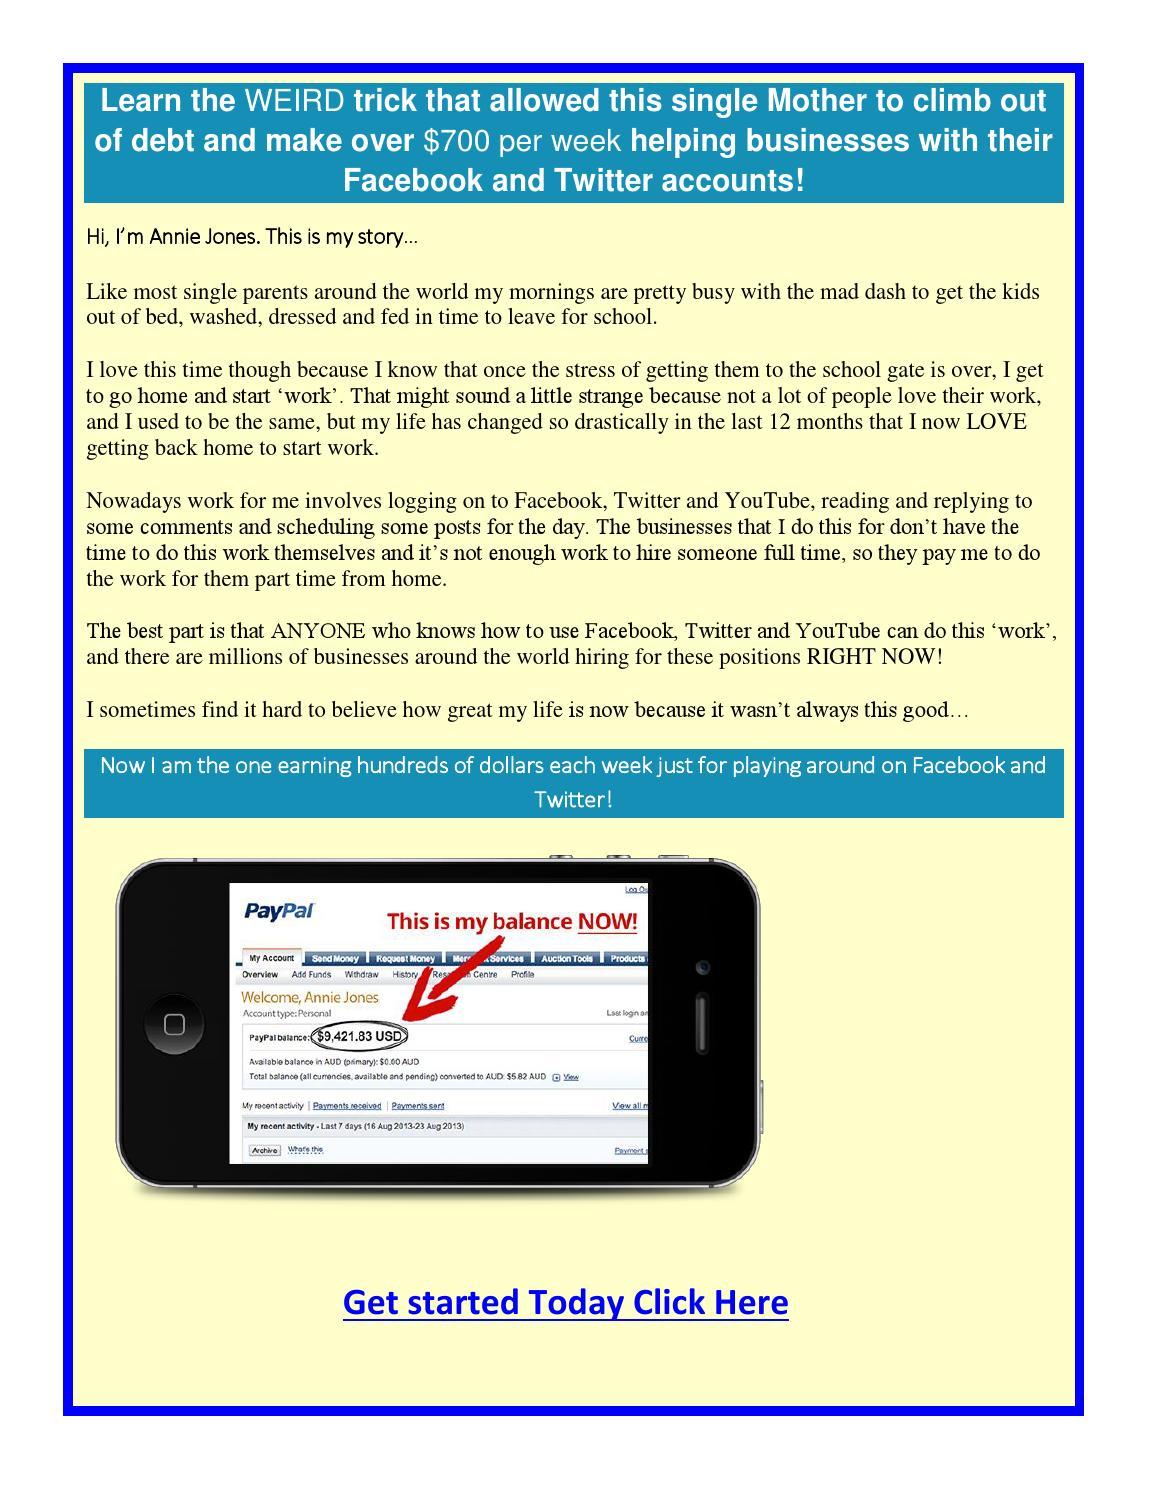 Making Web Money June 2015 by Harry Crowder - issuu